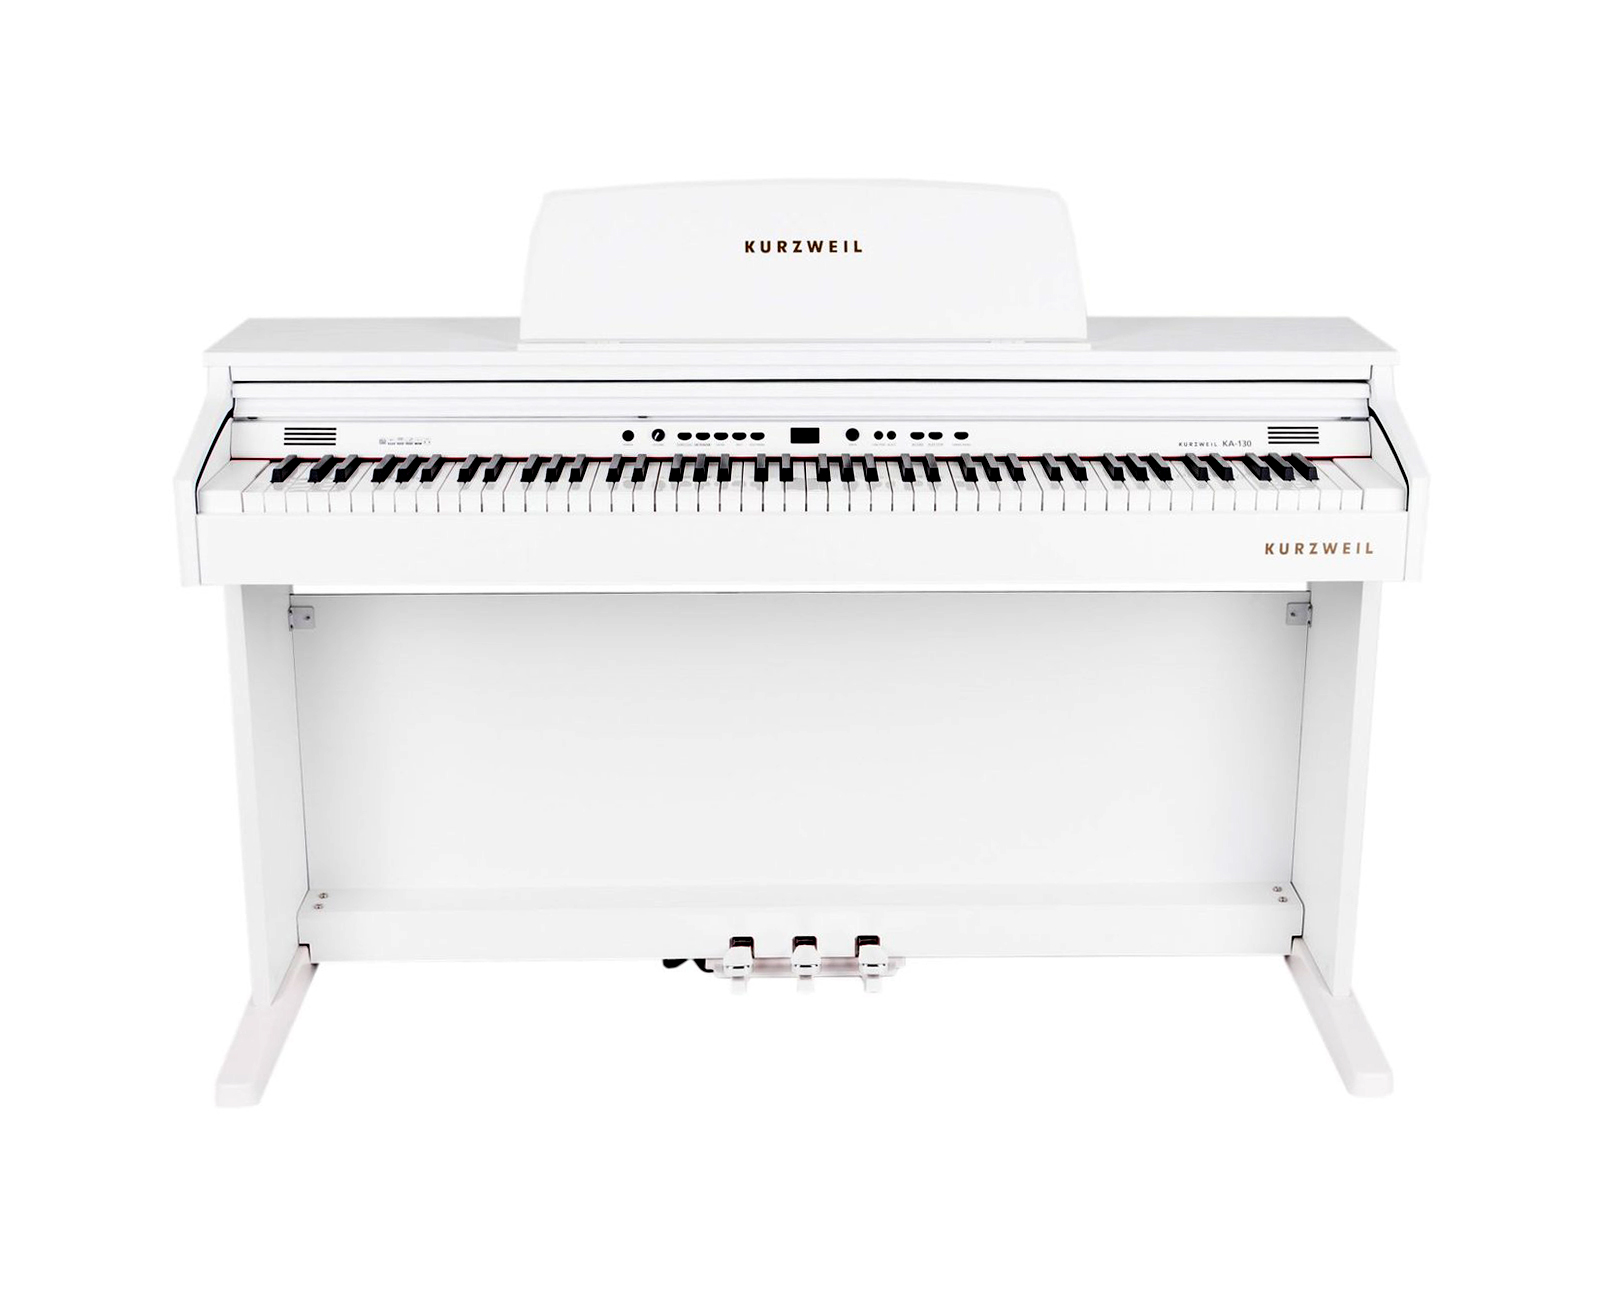 Цифровое пианино Kurzweil KA130 WH белое